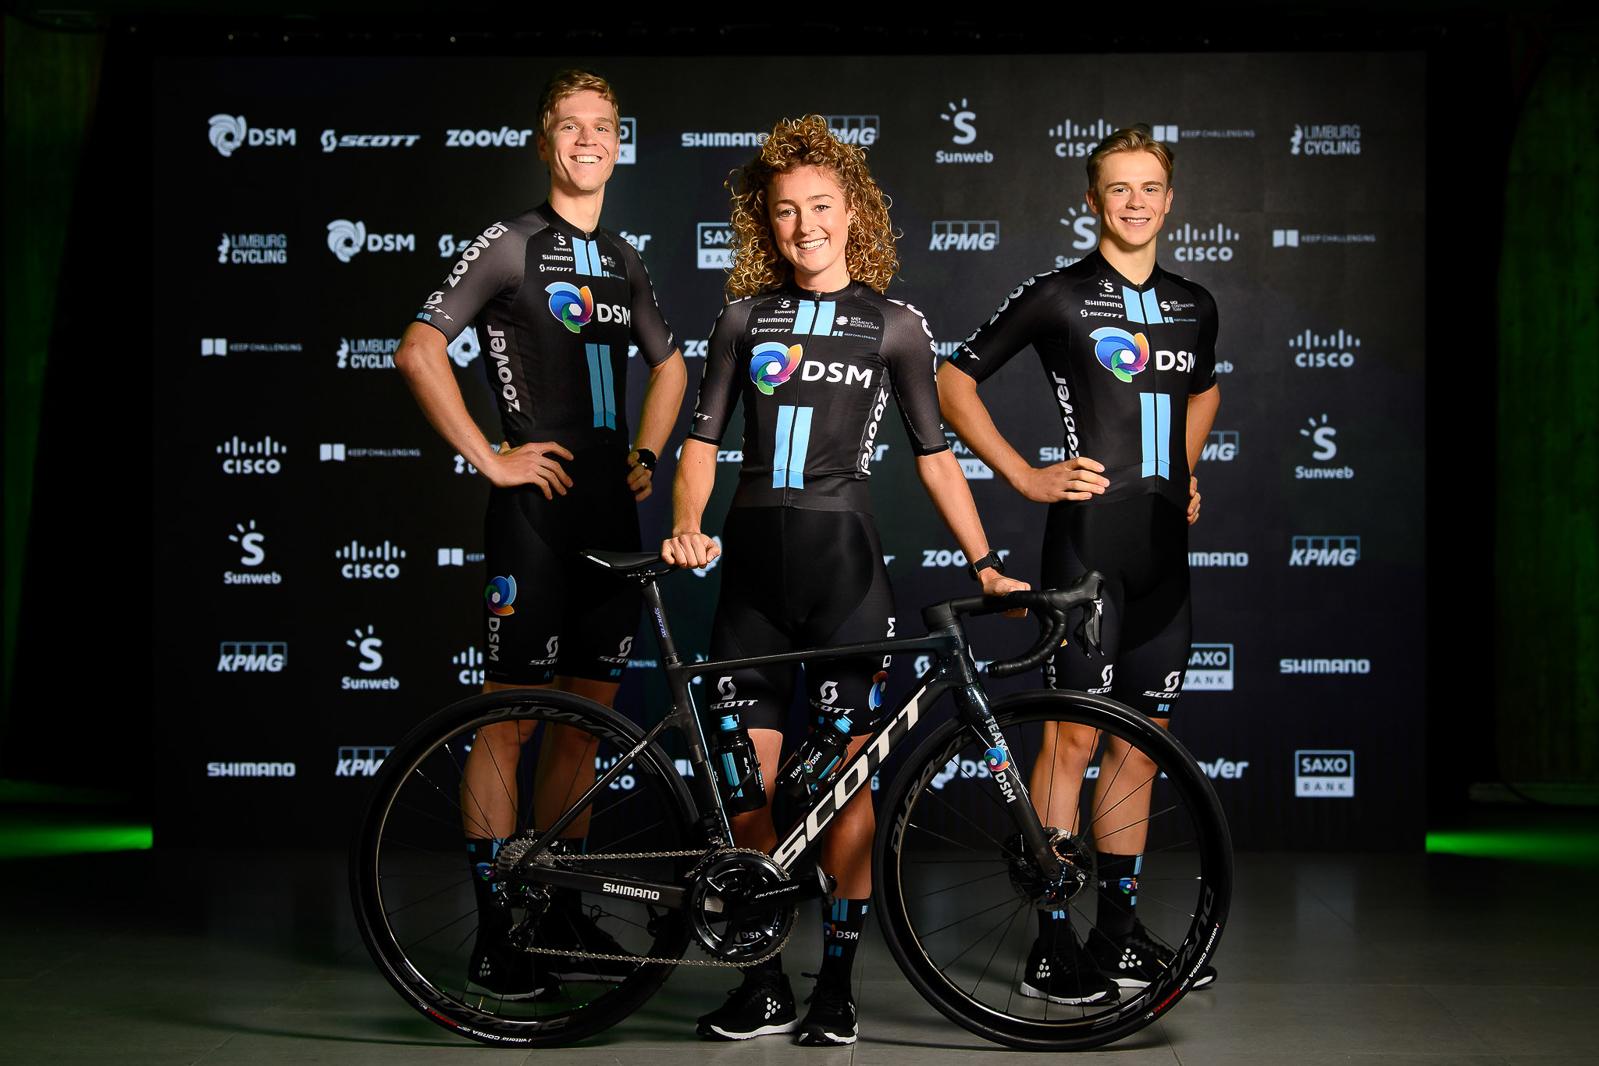 Sunweb drops as title sponsor, team will continue as Team DSM